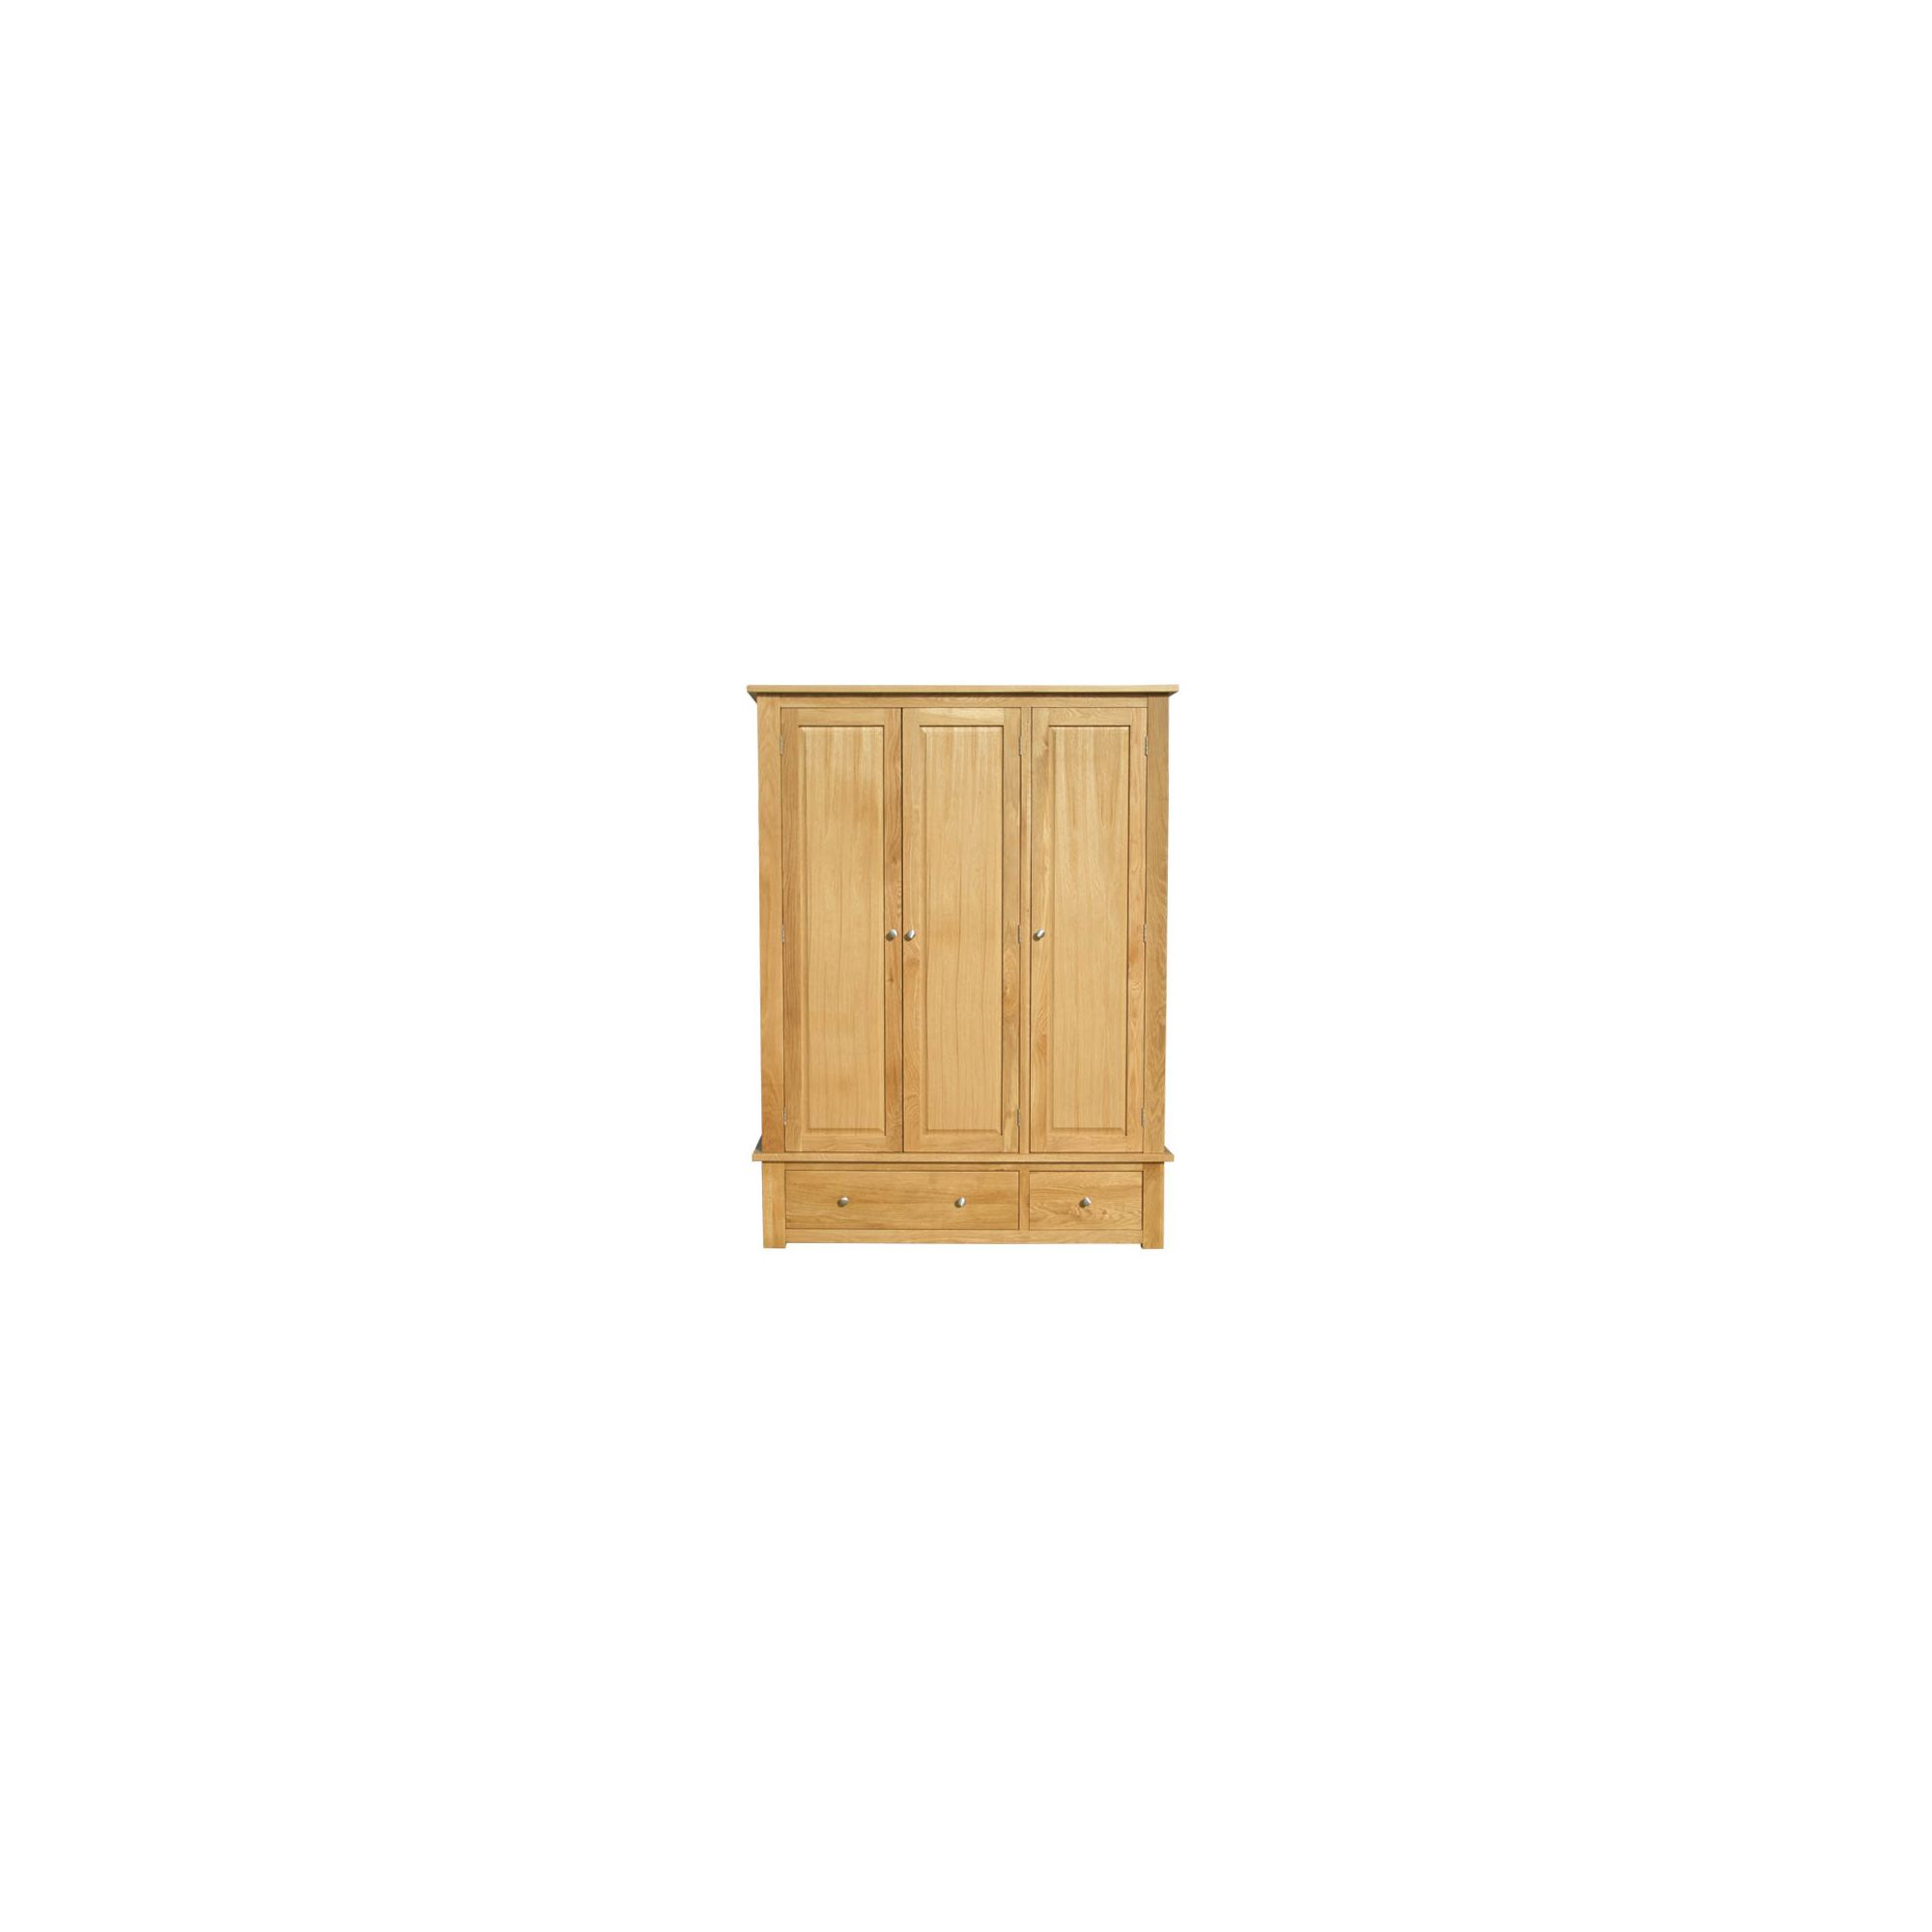 Home Zone Furniture Lincoln Oak 2009 Three Door Wardrobe at Tescos Direct